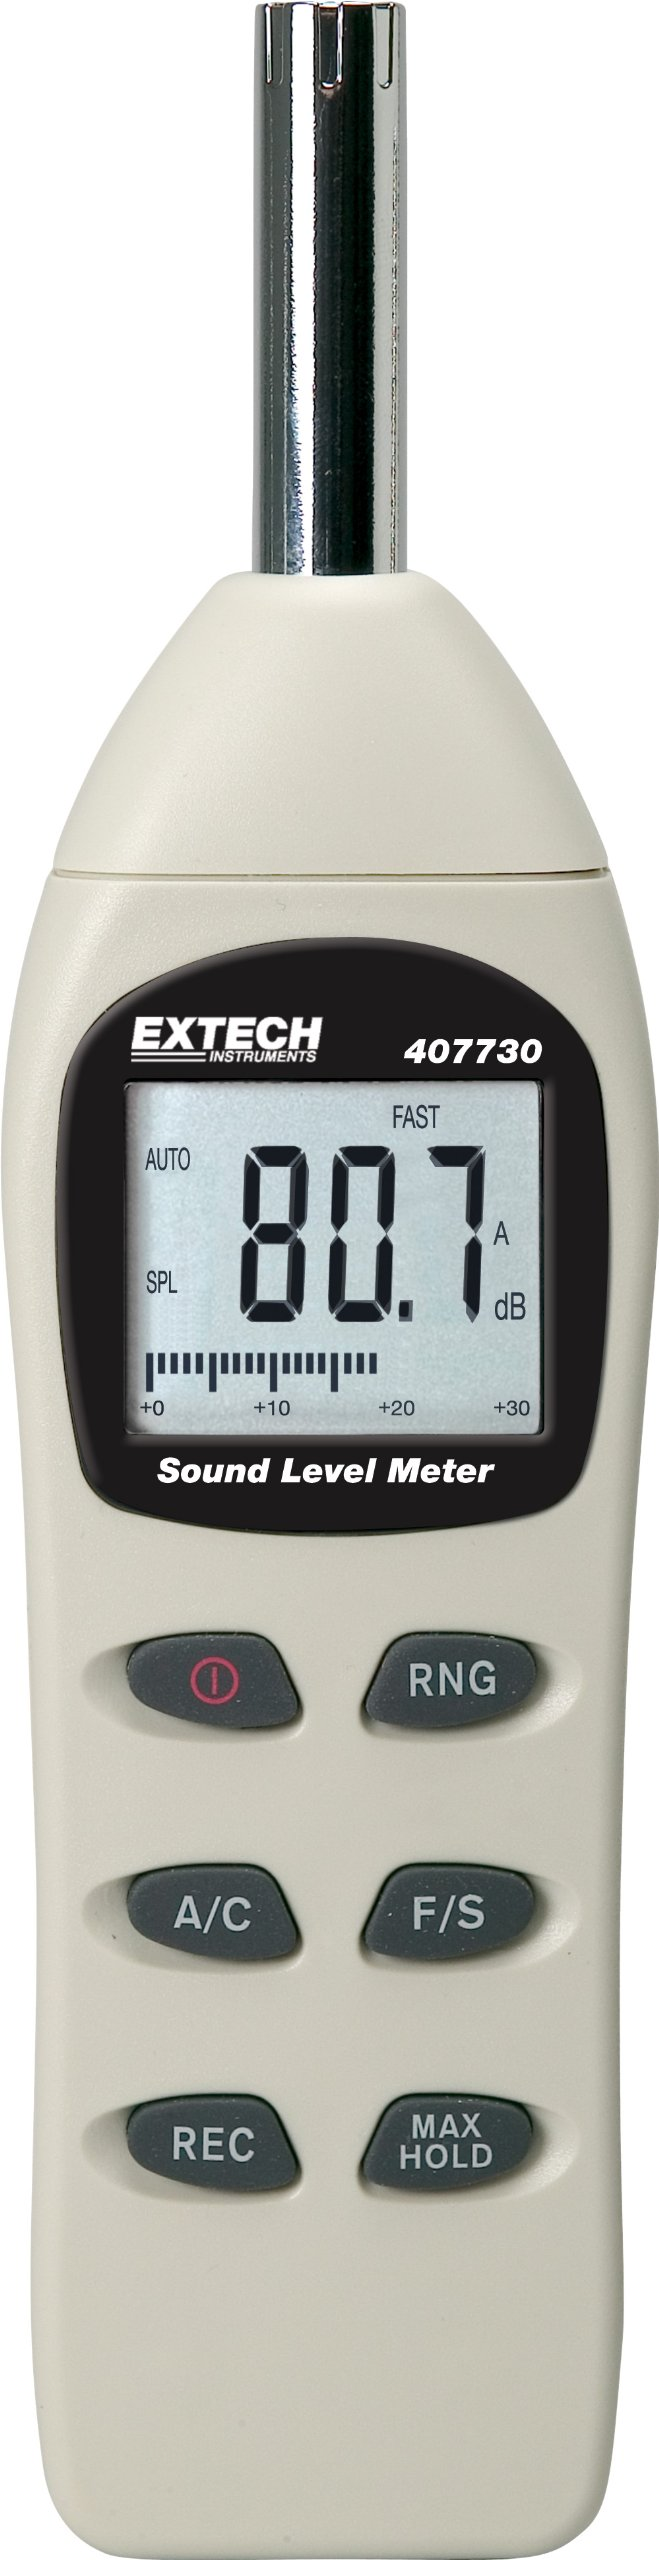 Extech 407730 Digital Sound Level Meter 40-130dB by Extech